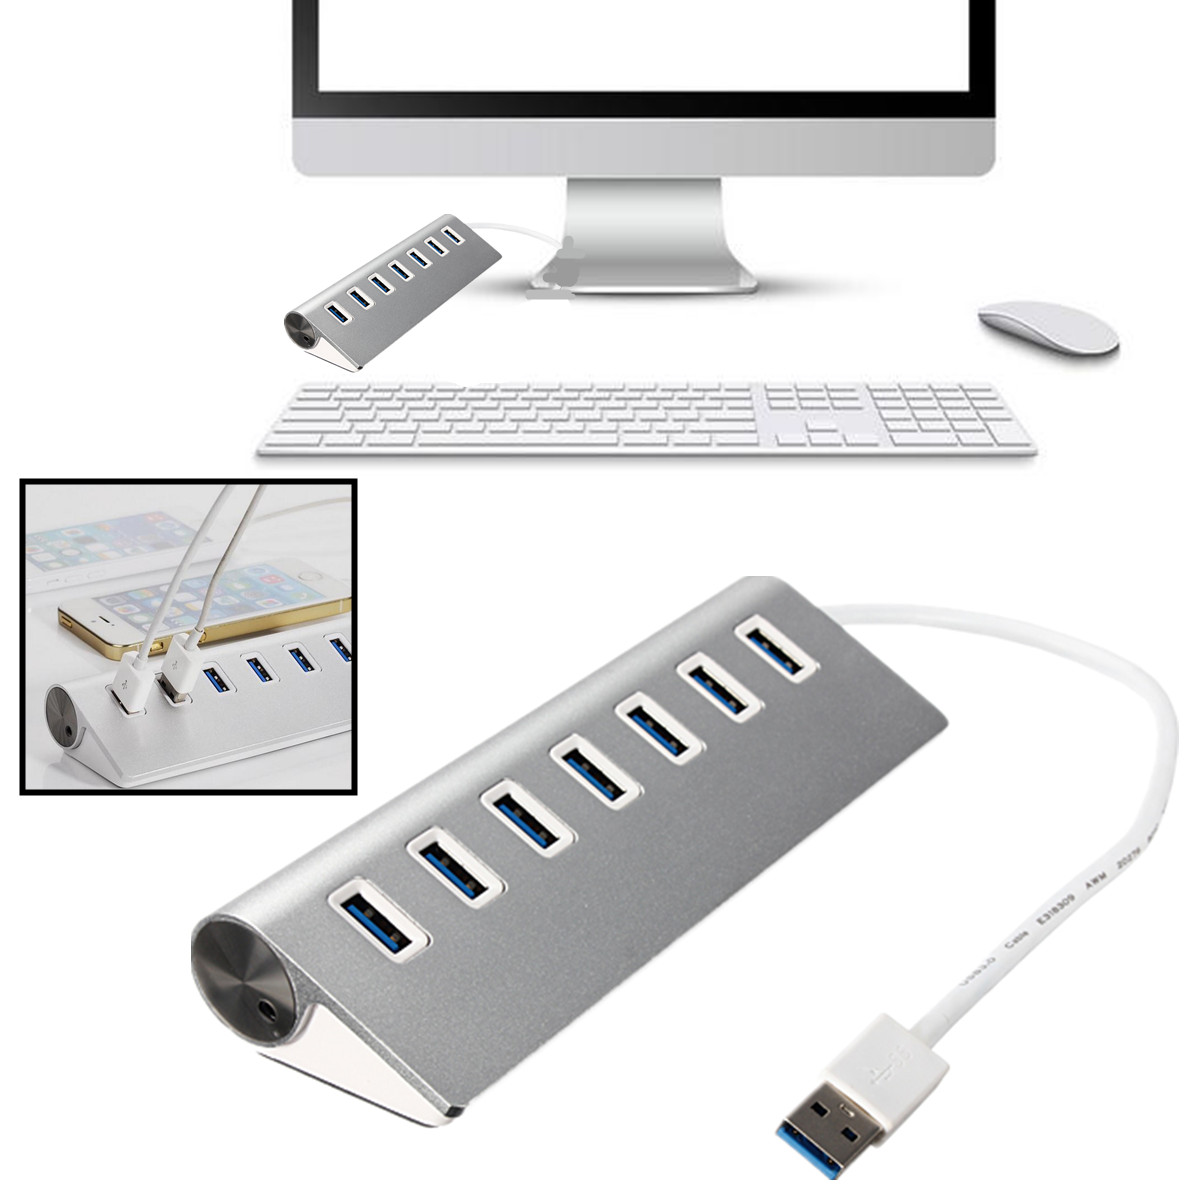 USB 3 0 Hub 7 Ports Adapter Aluminum for iPhone 6 5 MacBook Pro Mac PC Laptop | eBay